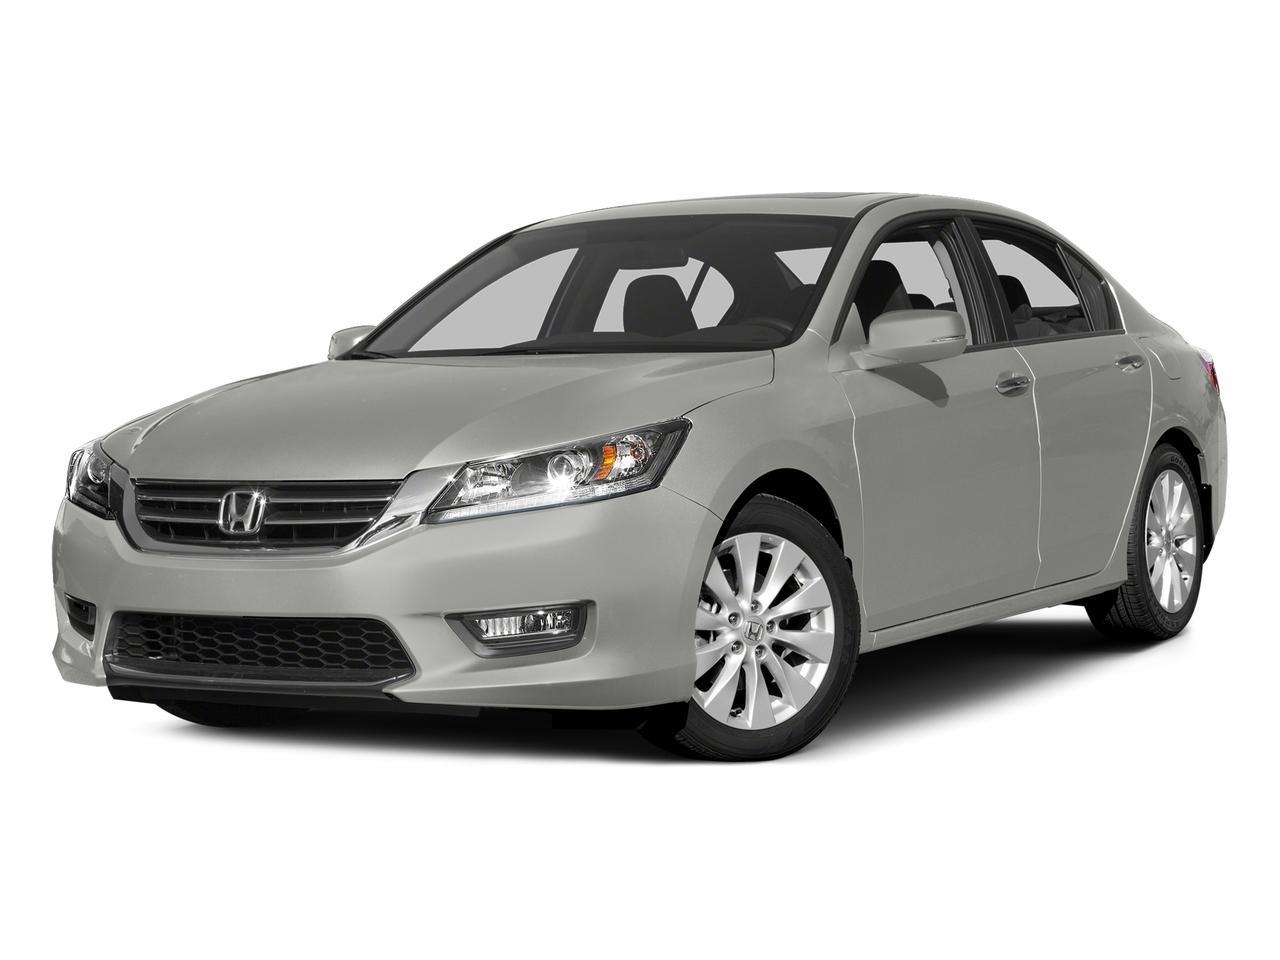 2015 Honda Accord Sedan Vehicle Photo in Richmond, VA 23231